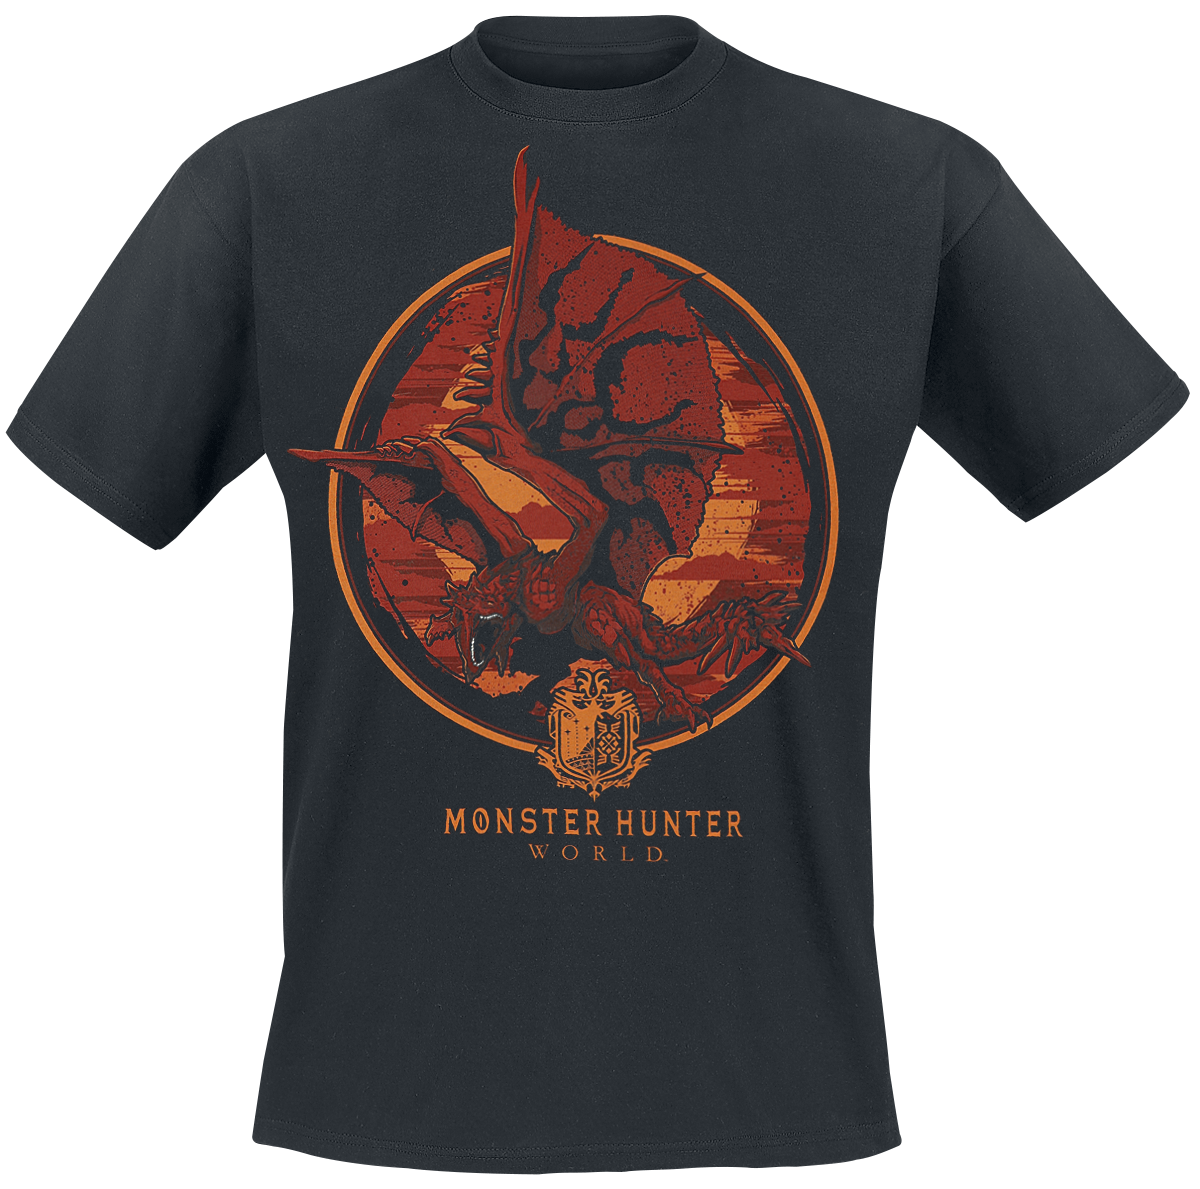 Monster Hunter - World - Screaming Rathalos - T-Shirt - black image